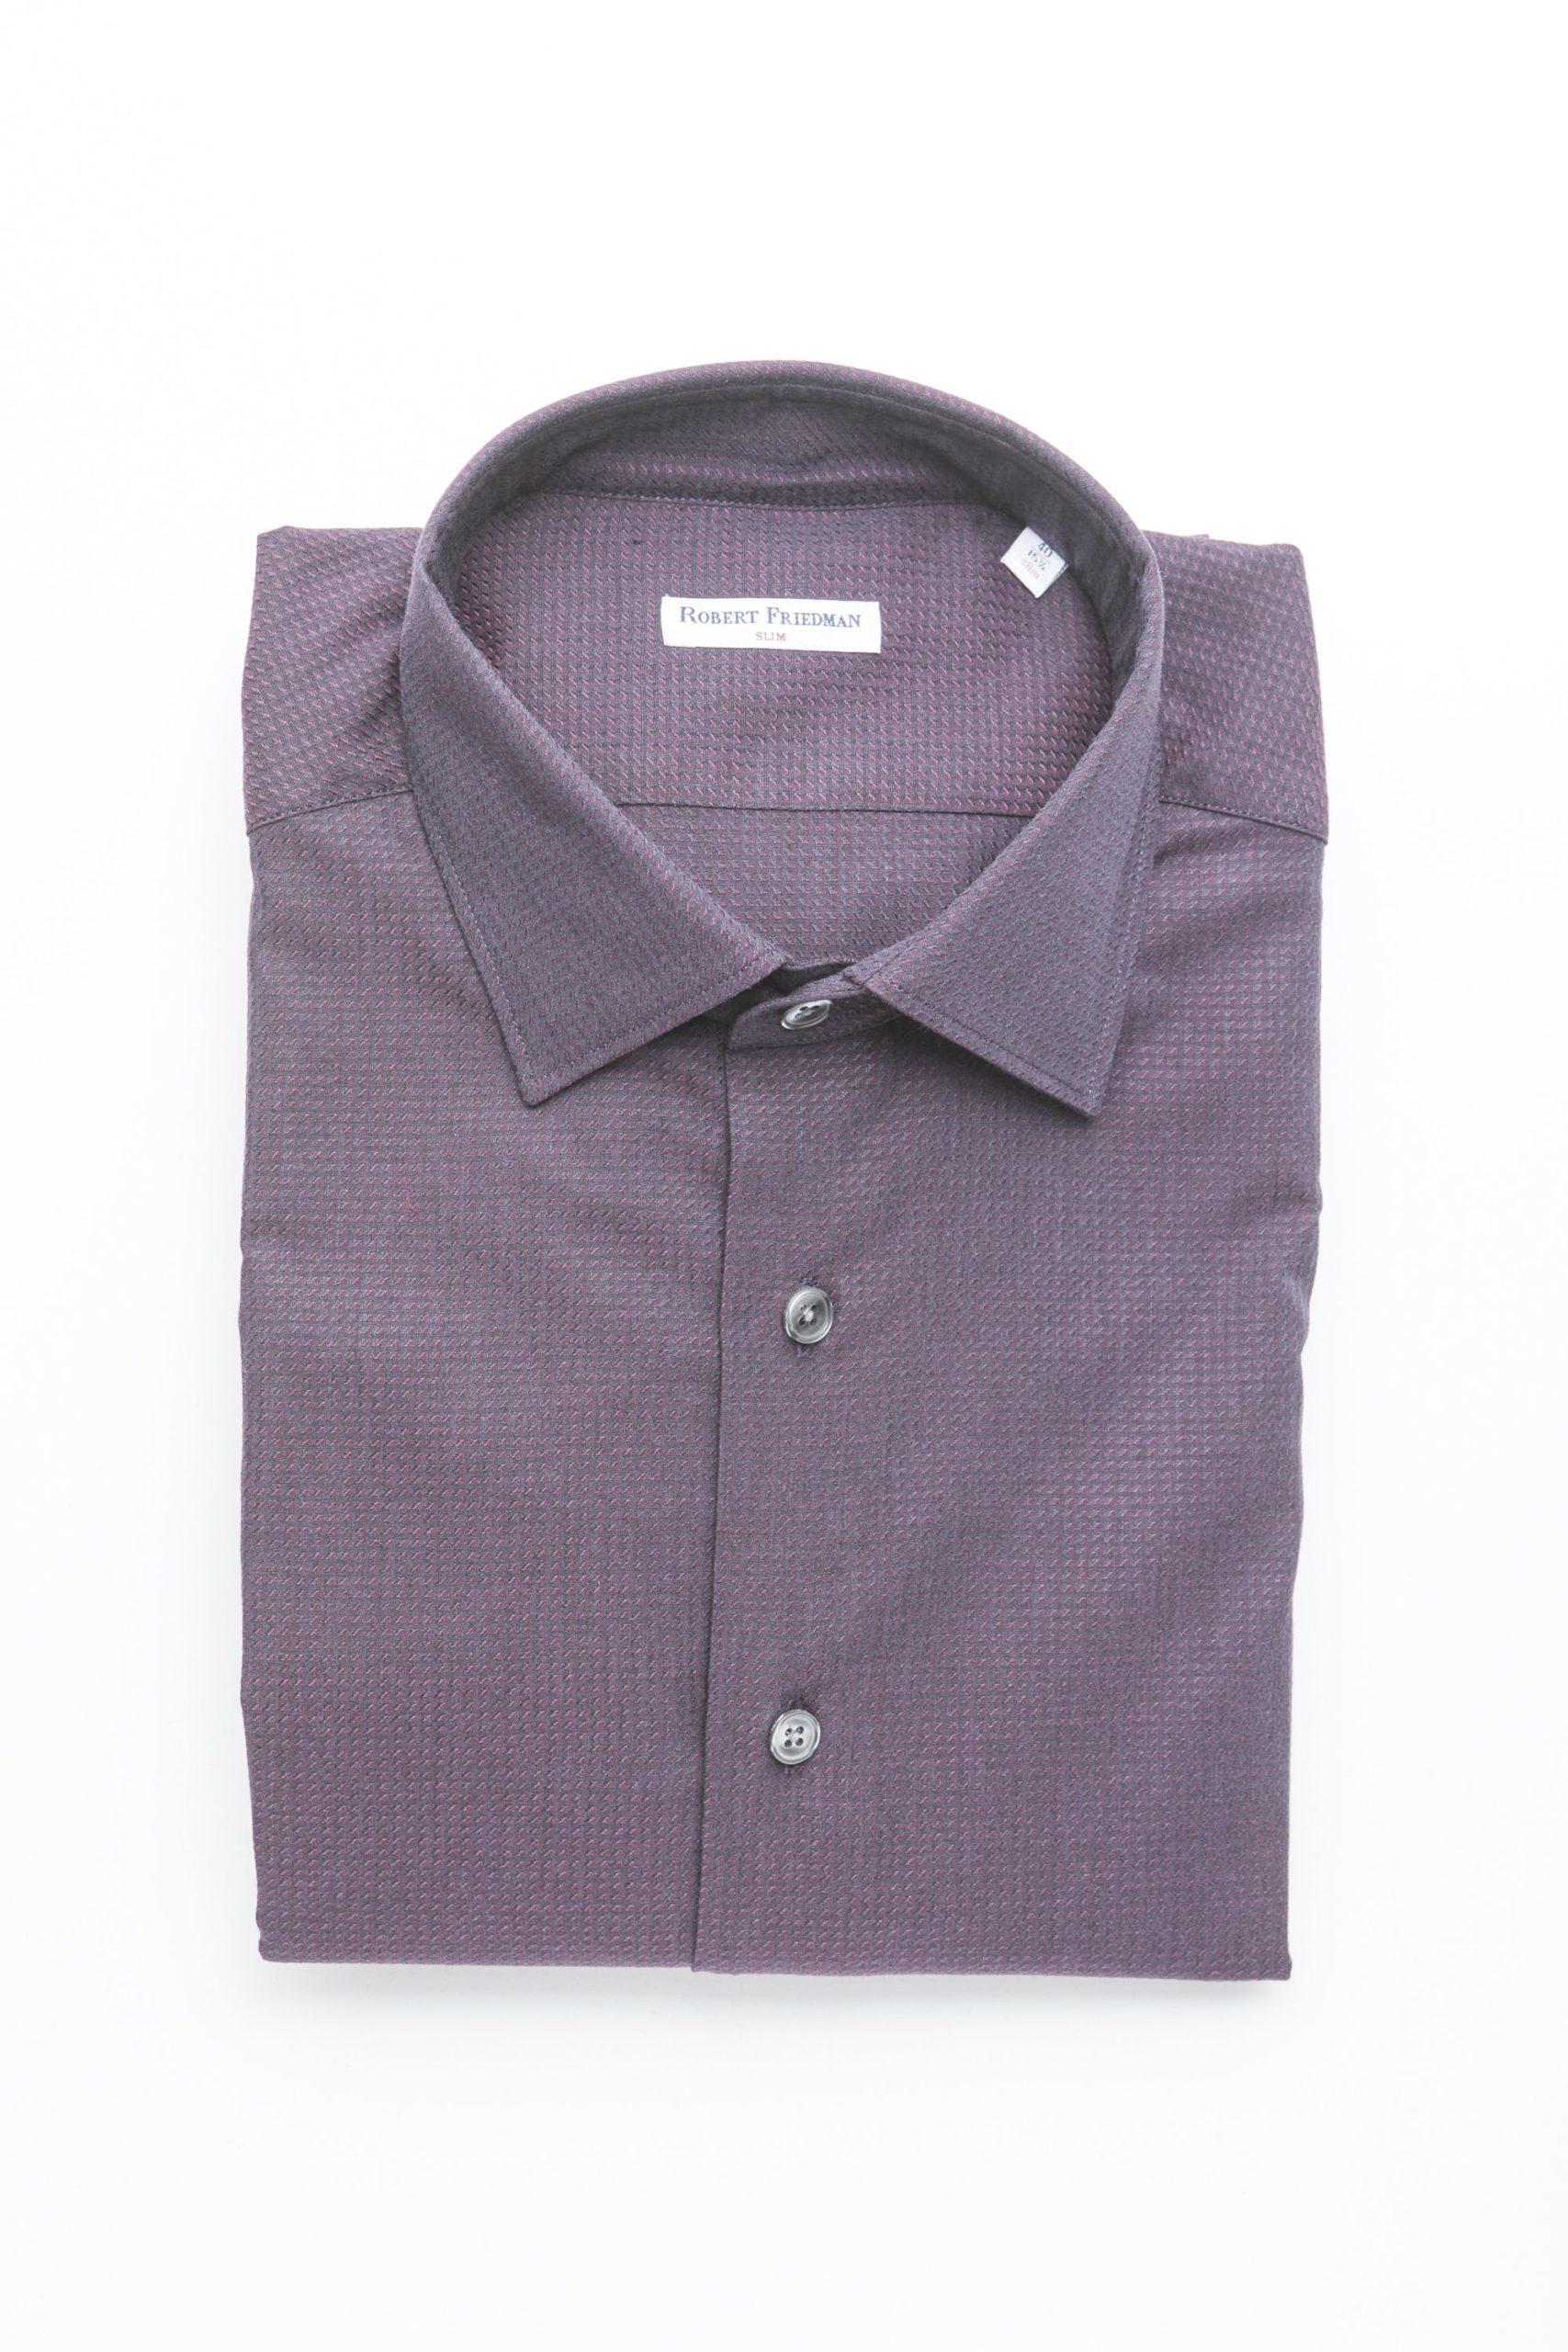 Robert Friedman Men's Shirt Burgundy RO1394999 - IT46 | S